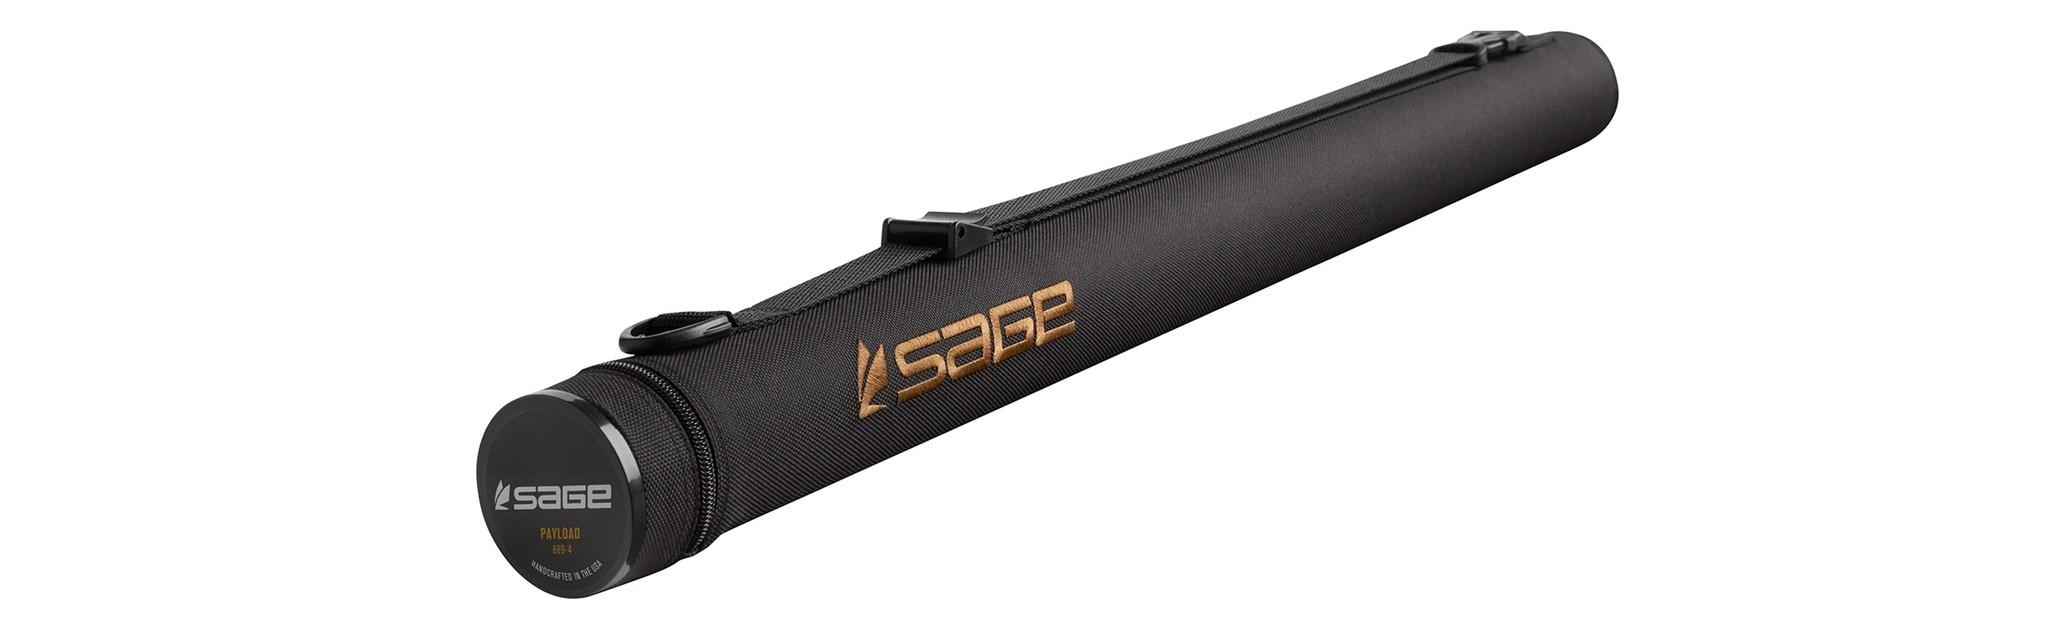 Sage Sage Payload Fly Rod,